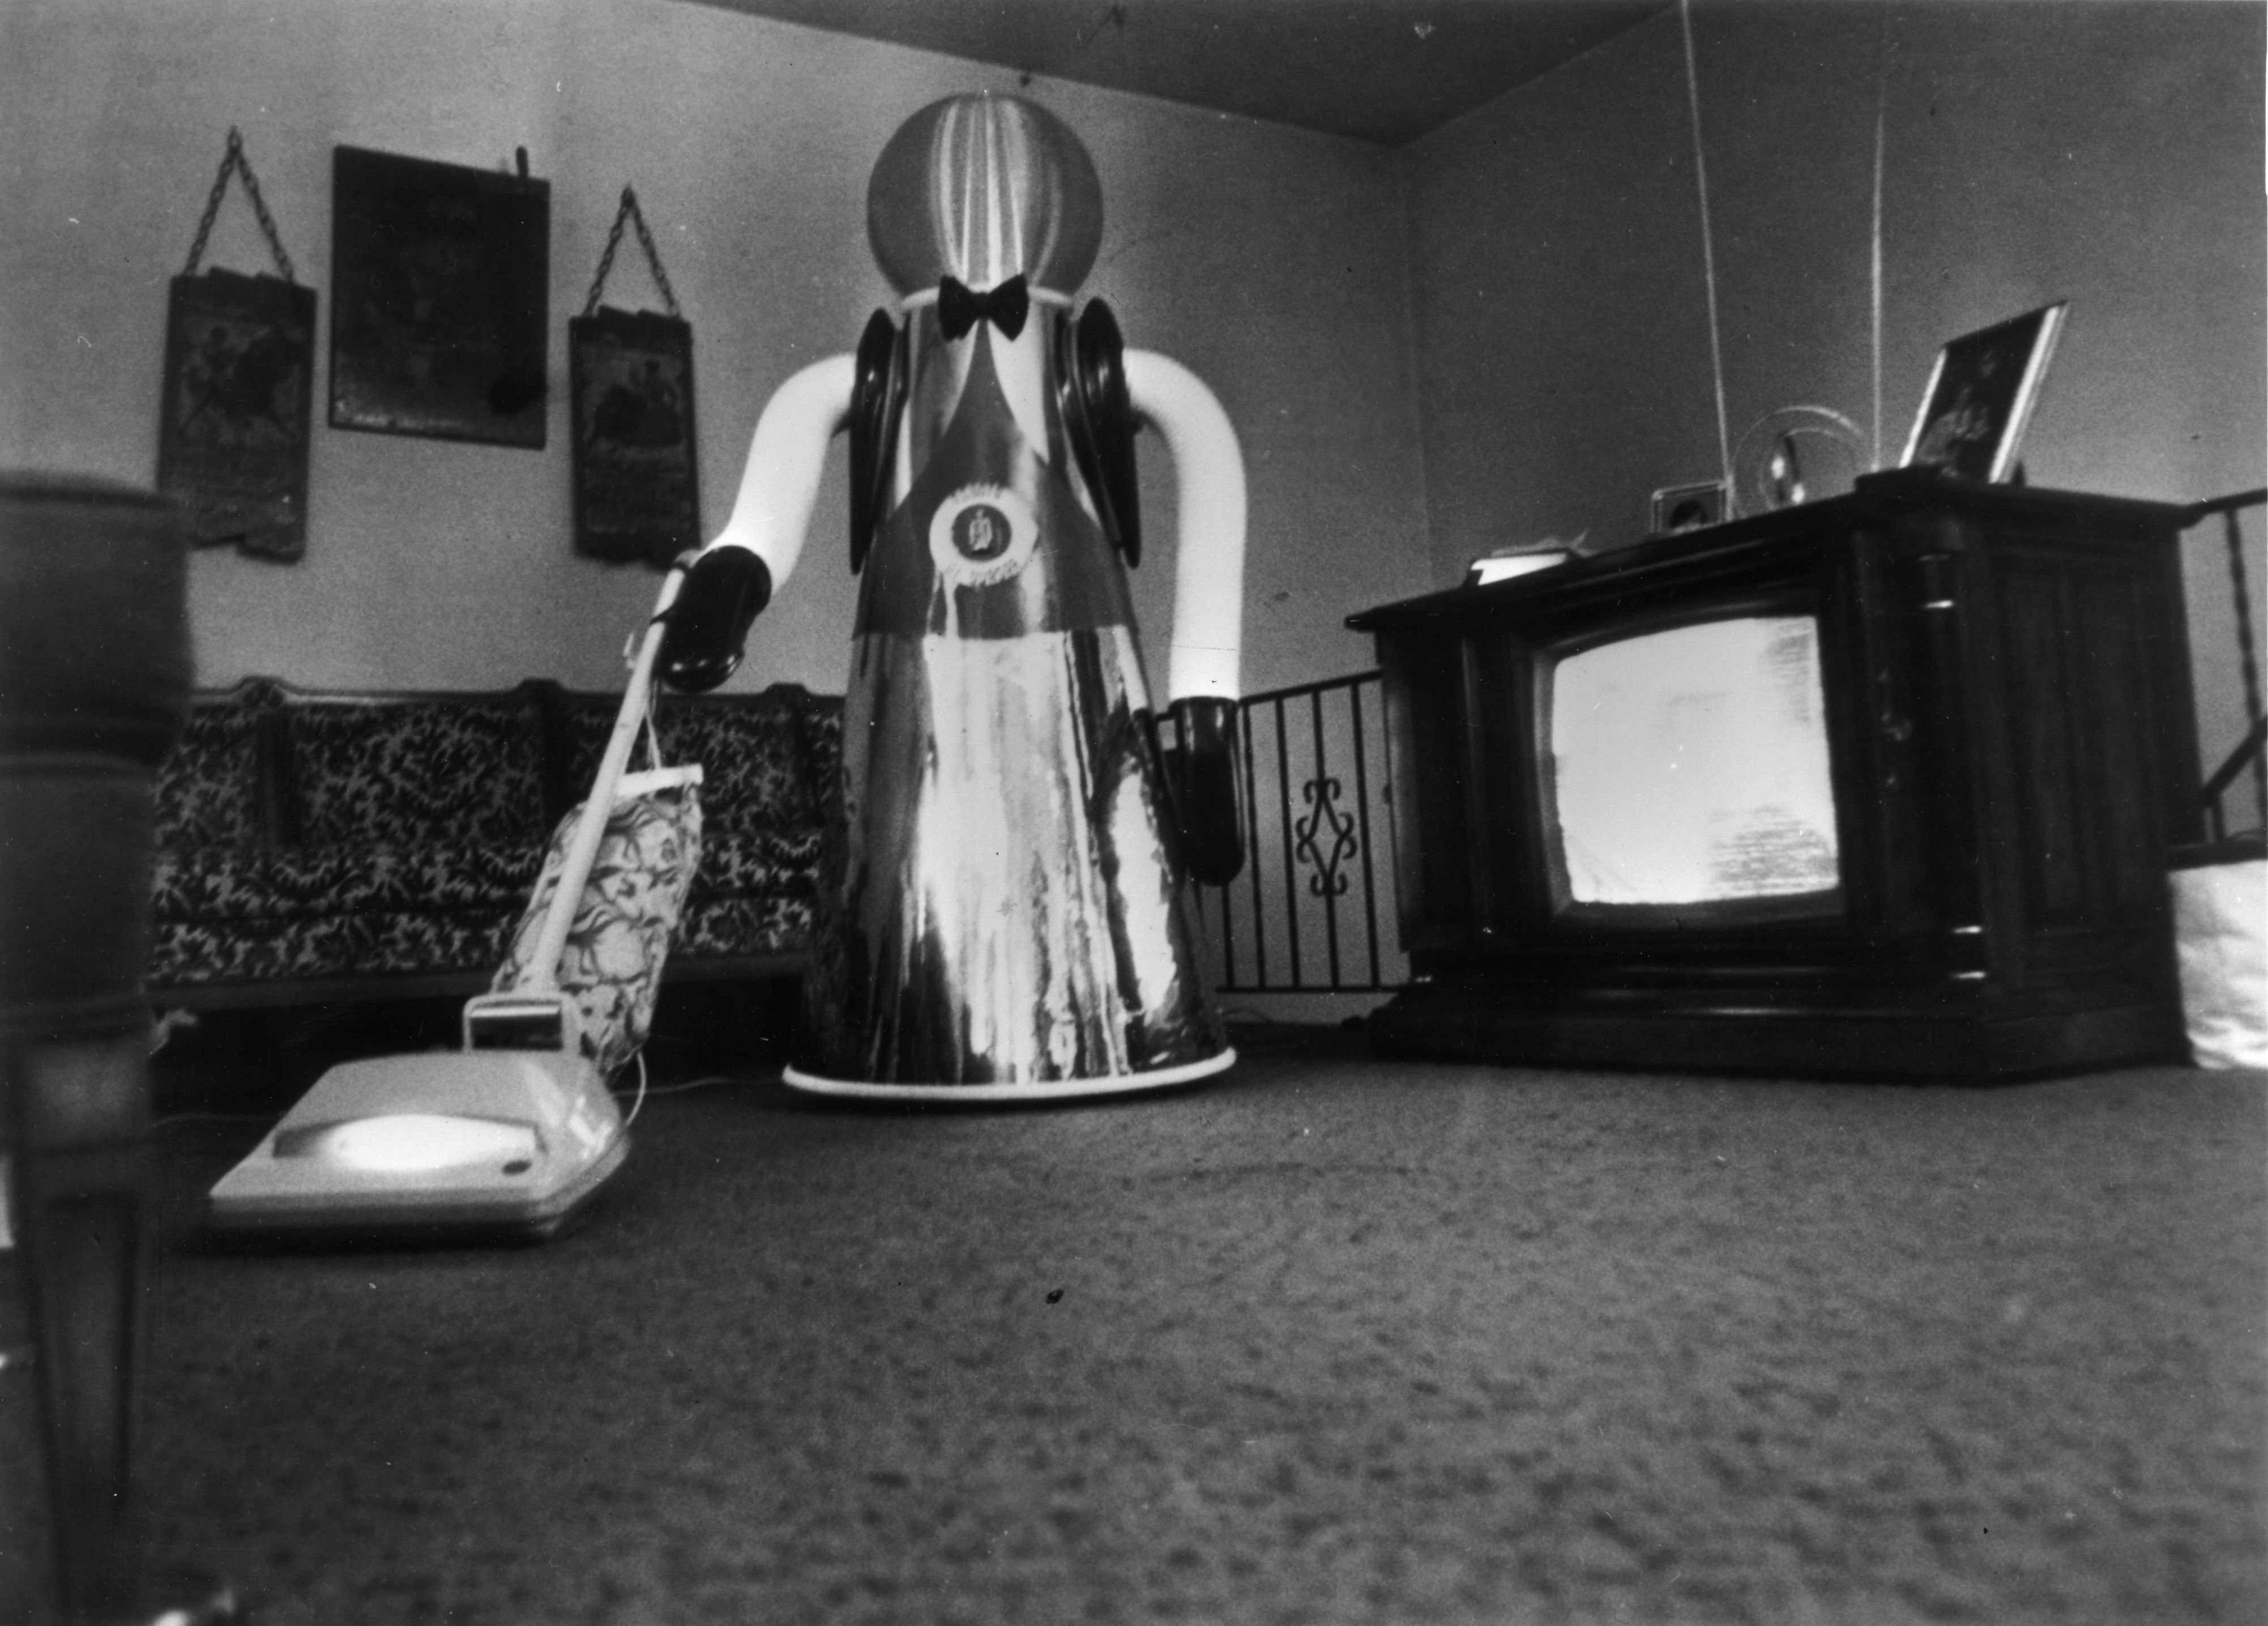 Vacuuming Robot